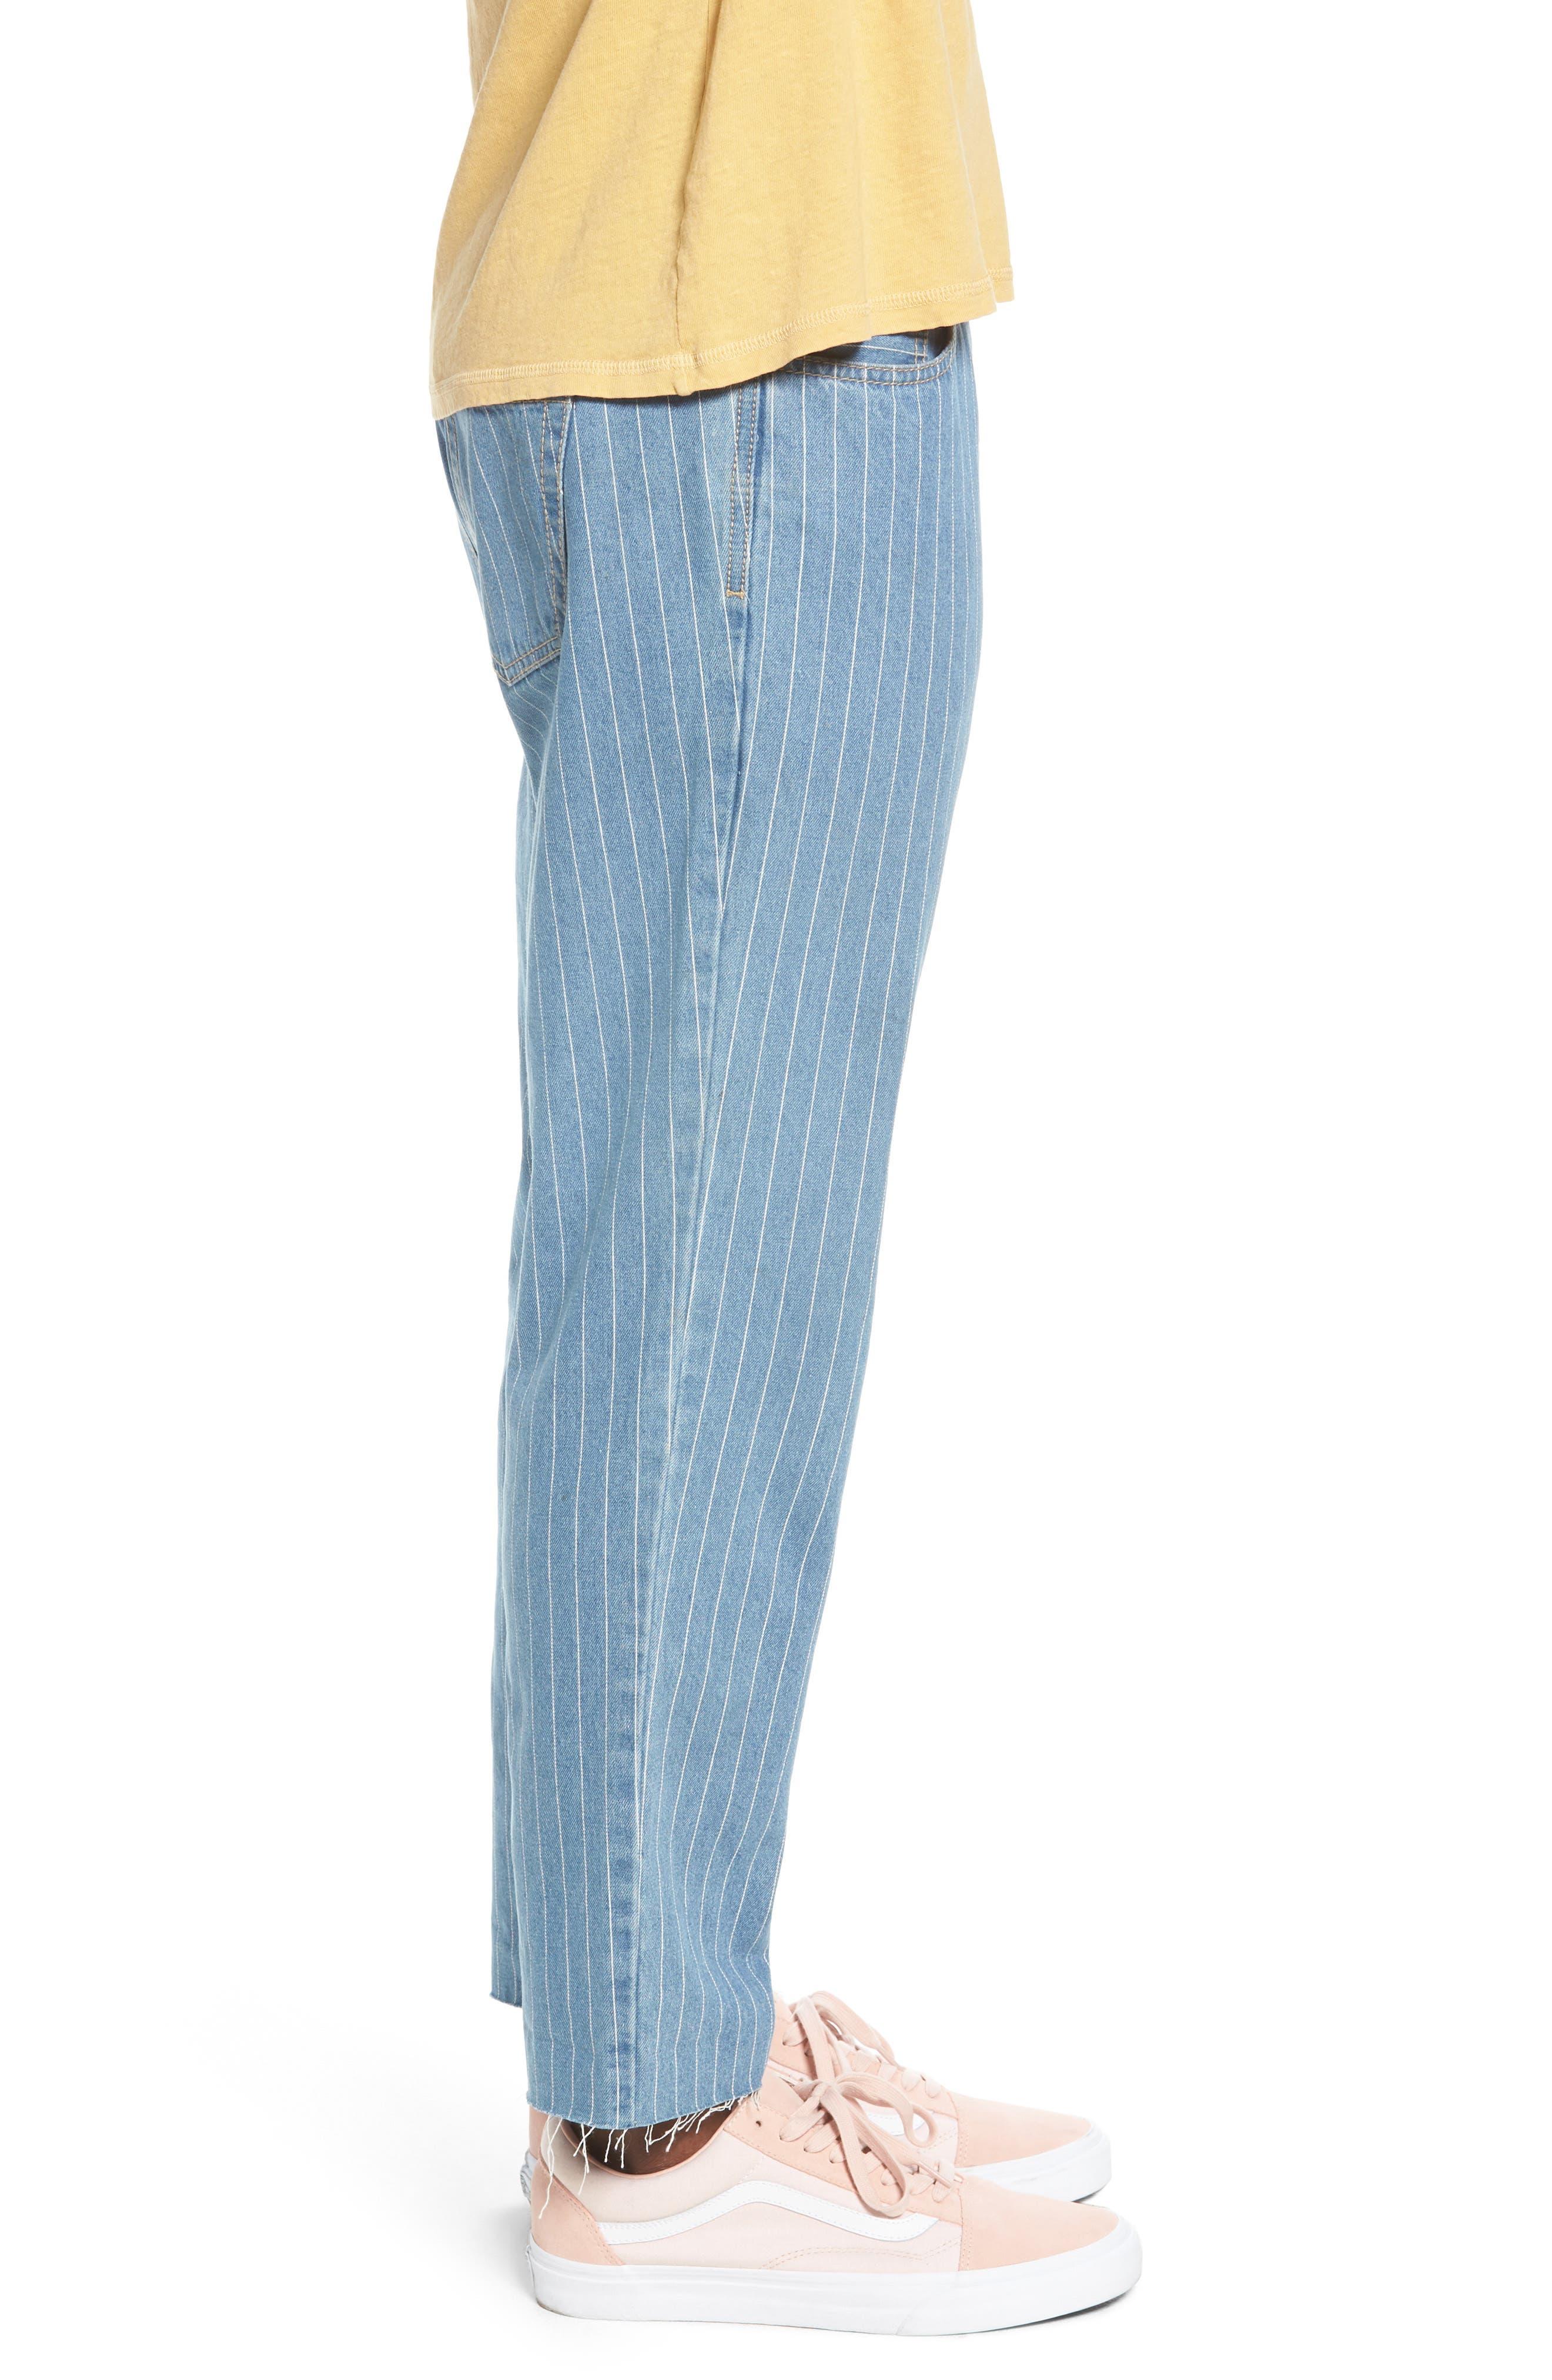 B. Relaxed Jeans,                             Alternate thumbnail 3, color,                             Stripe Denim Crop